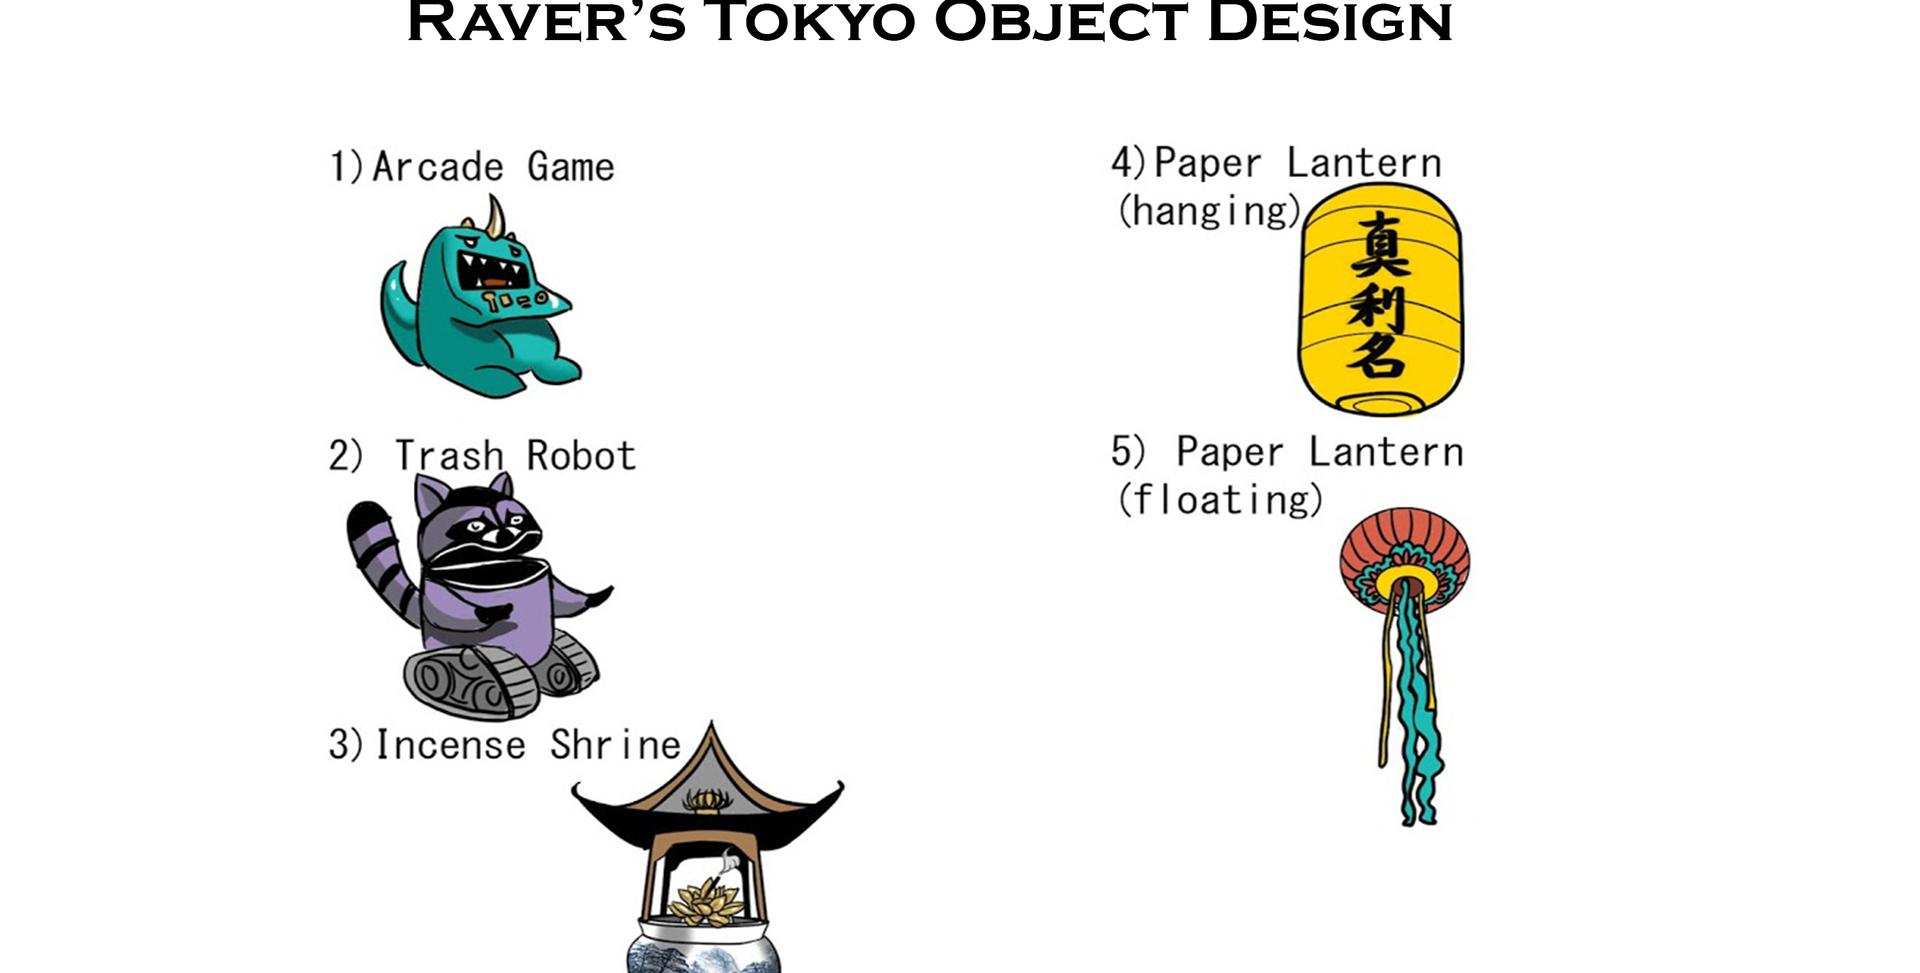 tokyo object design.png